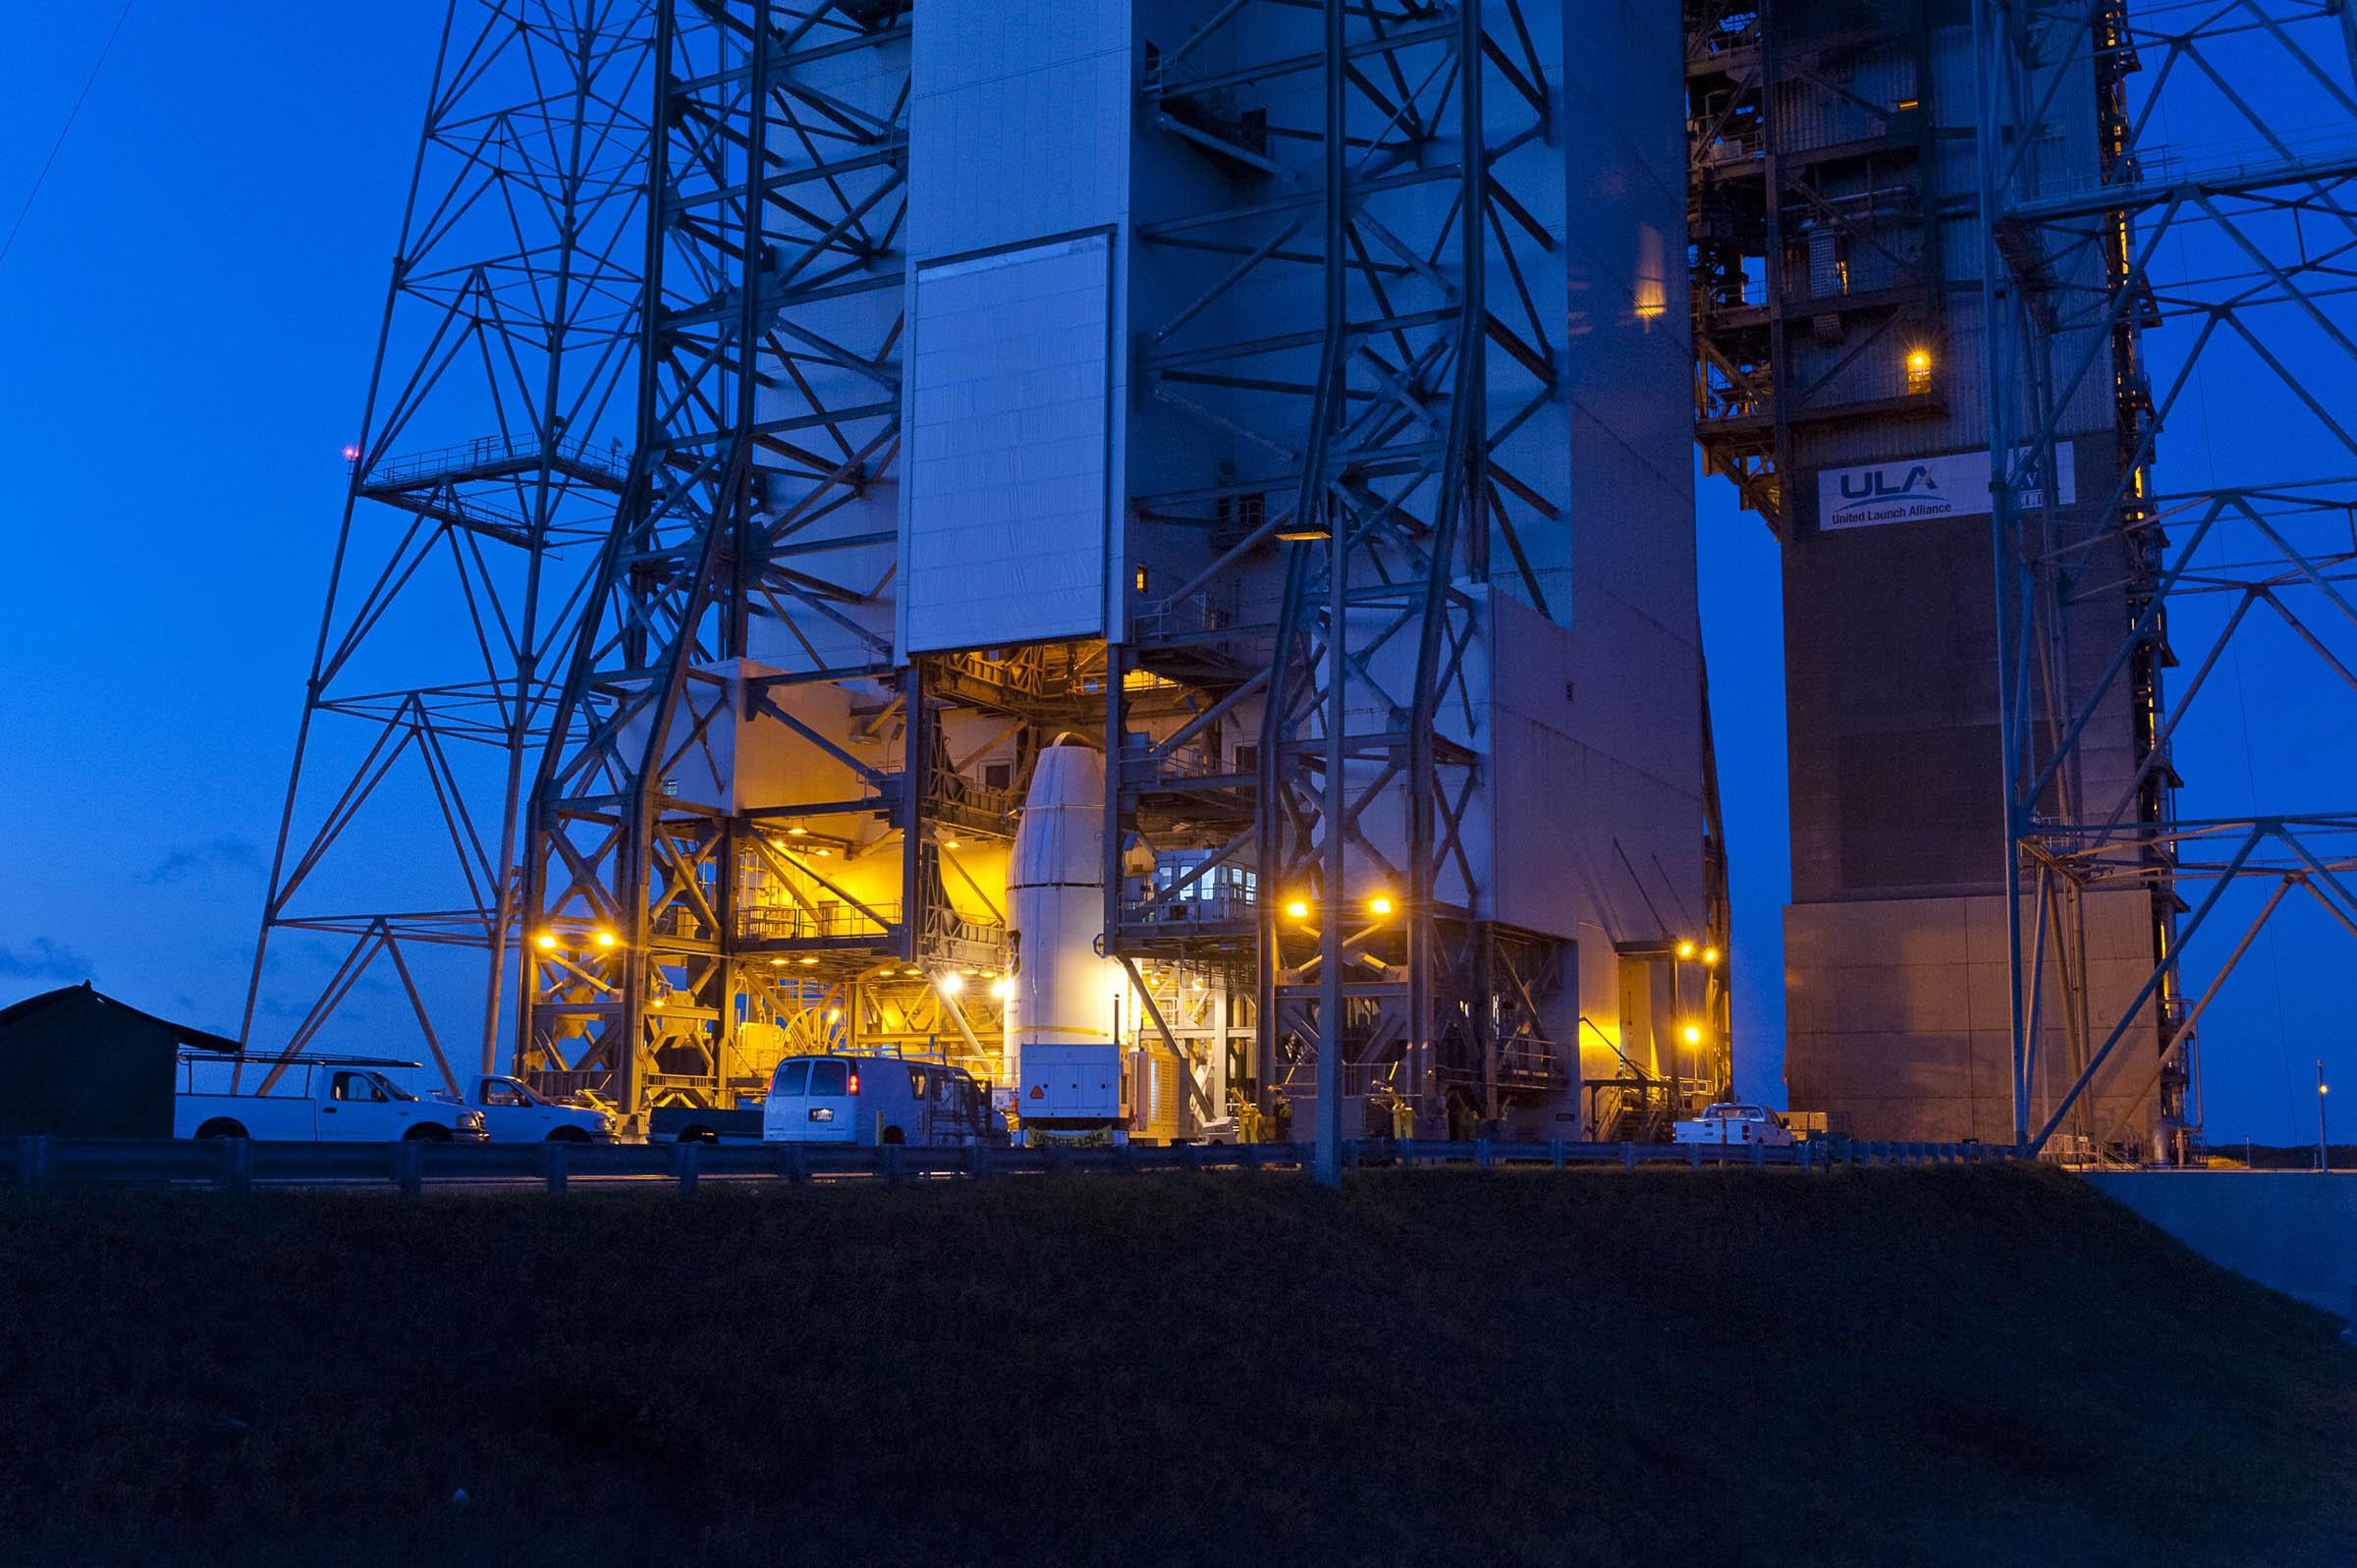 GPS IIF-3 Satellite Encapsulated Inside Payload Fairing